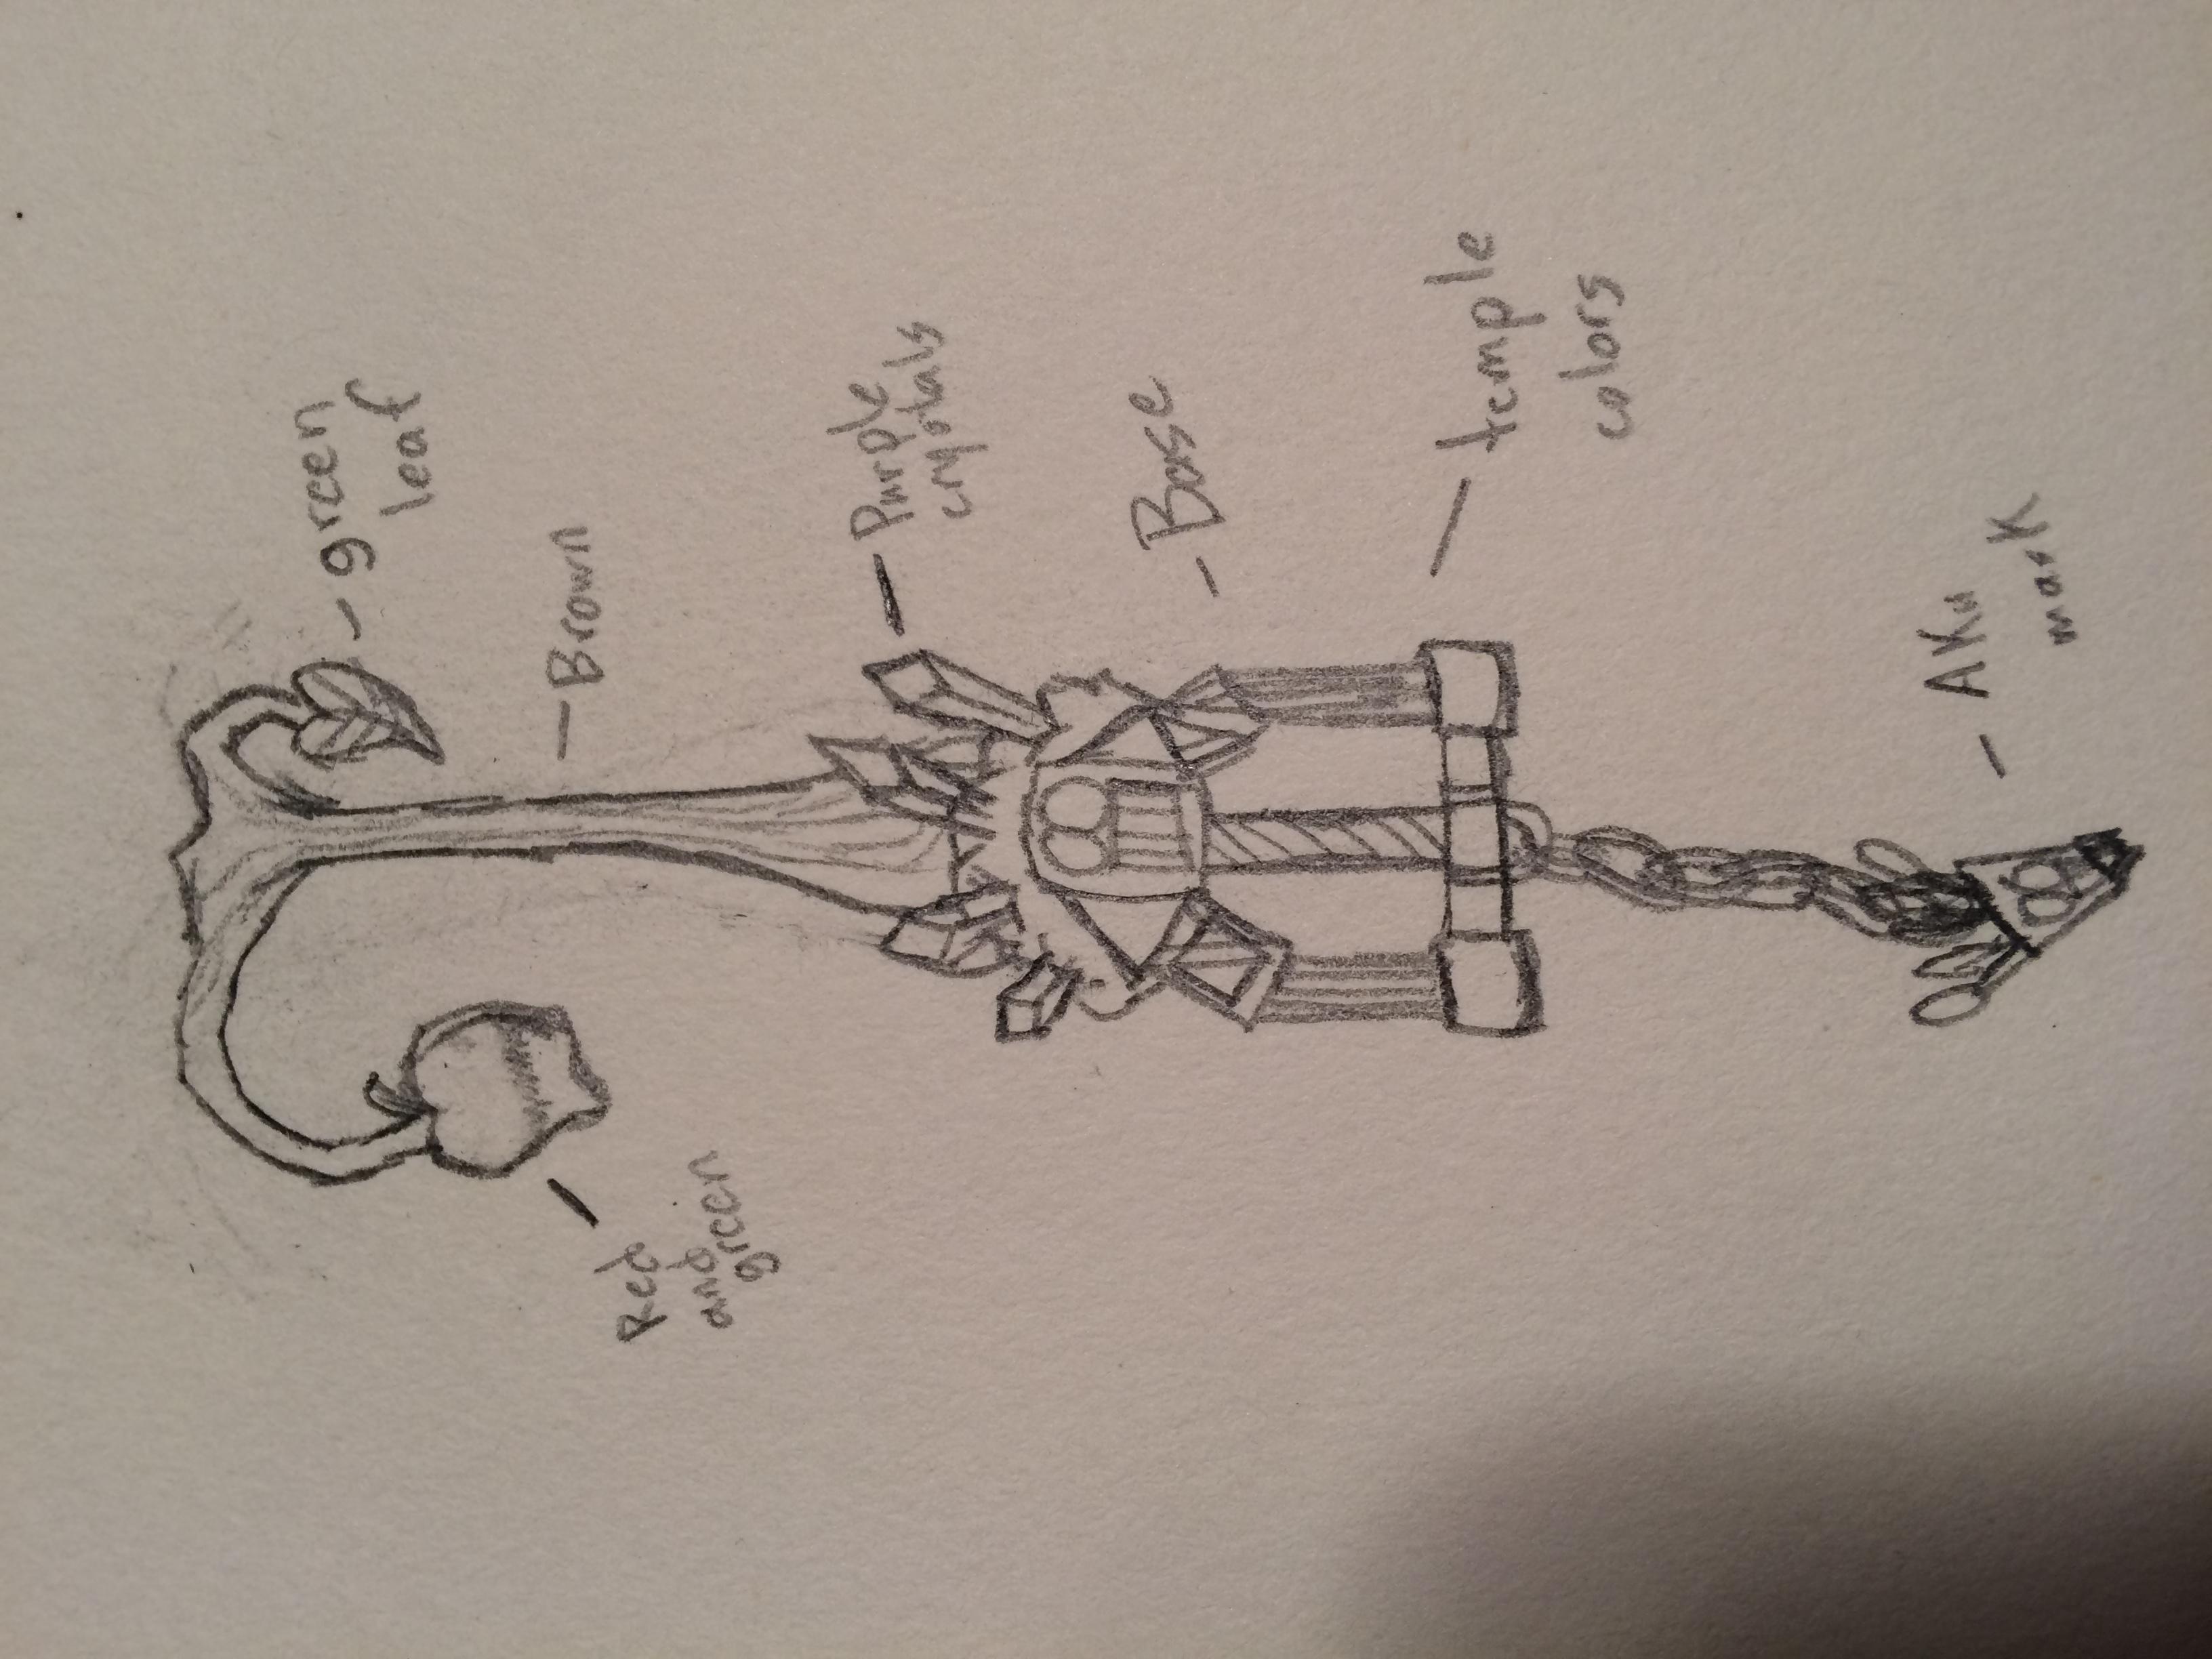 Crash Bandicoot Keyblade